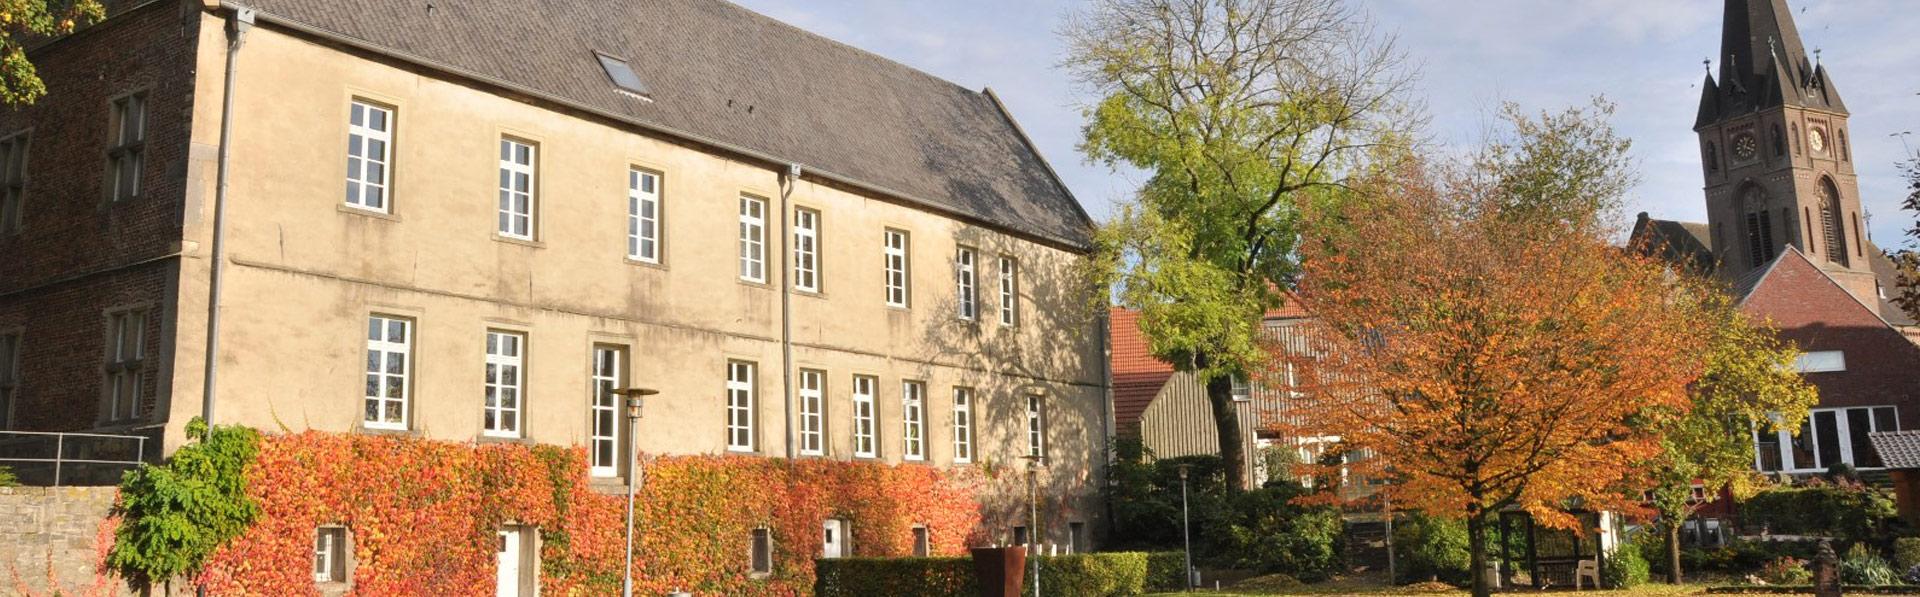 Nienborg langes Haus